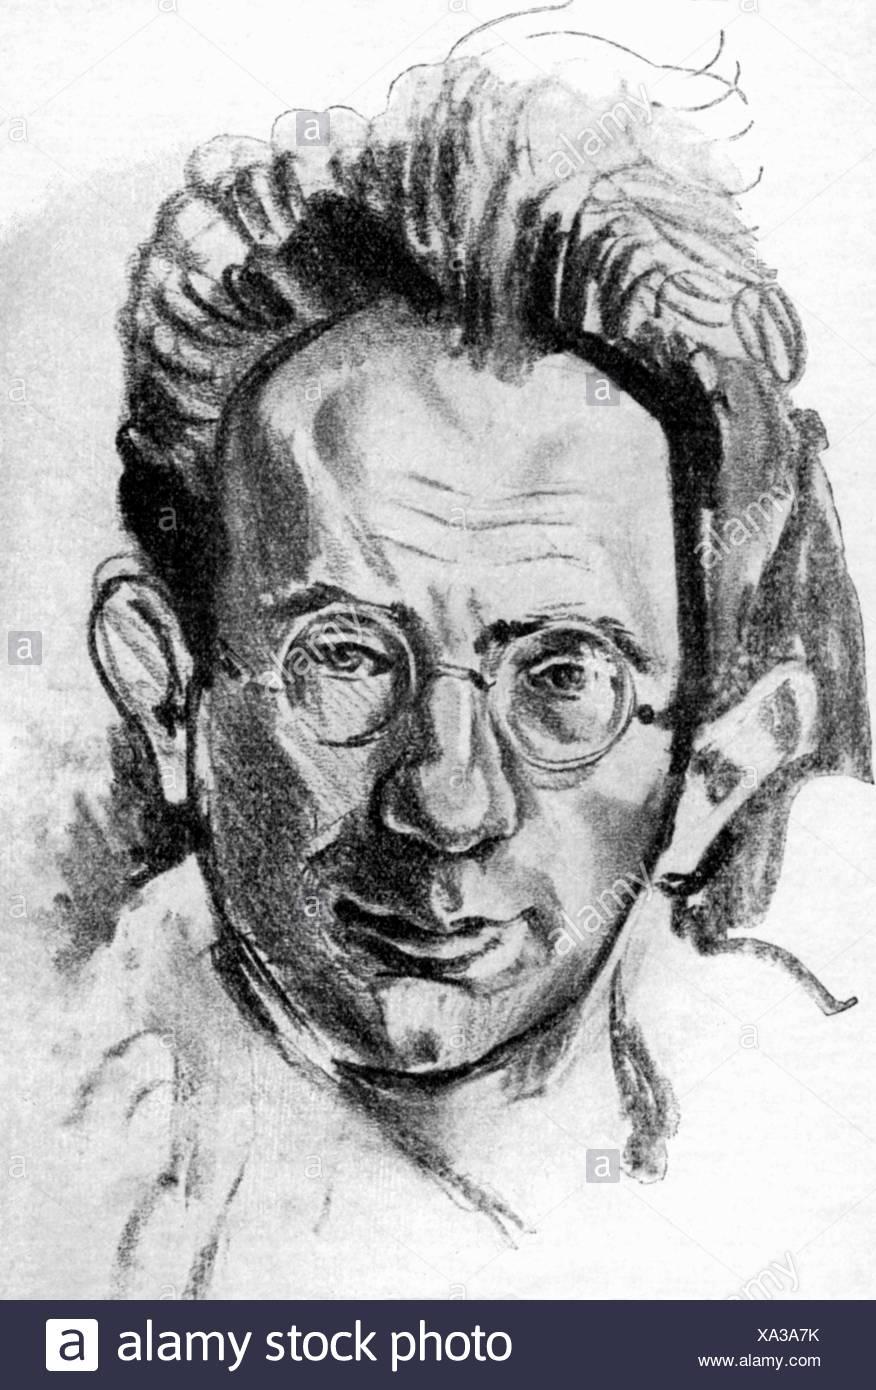 Kornfeld, Paul, 11.12.1889 - 25.4.1942, German dramatist, portrait, chalk drawing by F. K. Delavilla, Additional-Rights-Clearances-NA - Stock Image